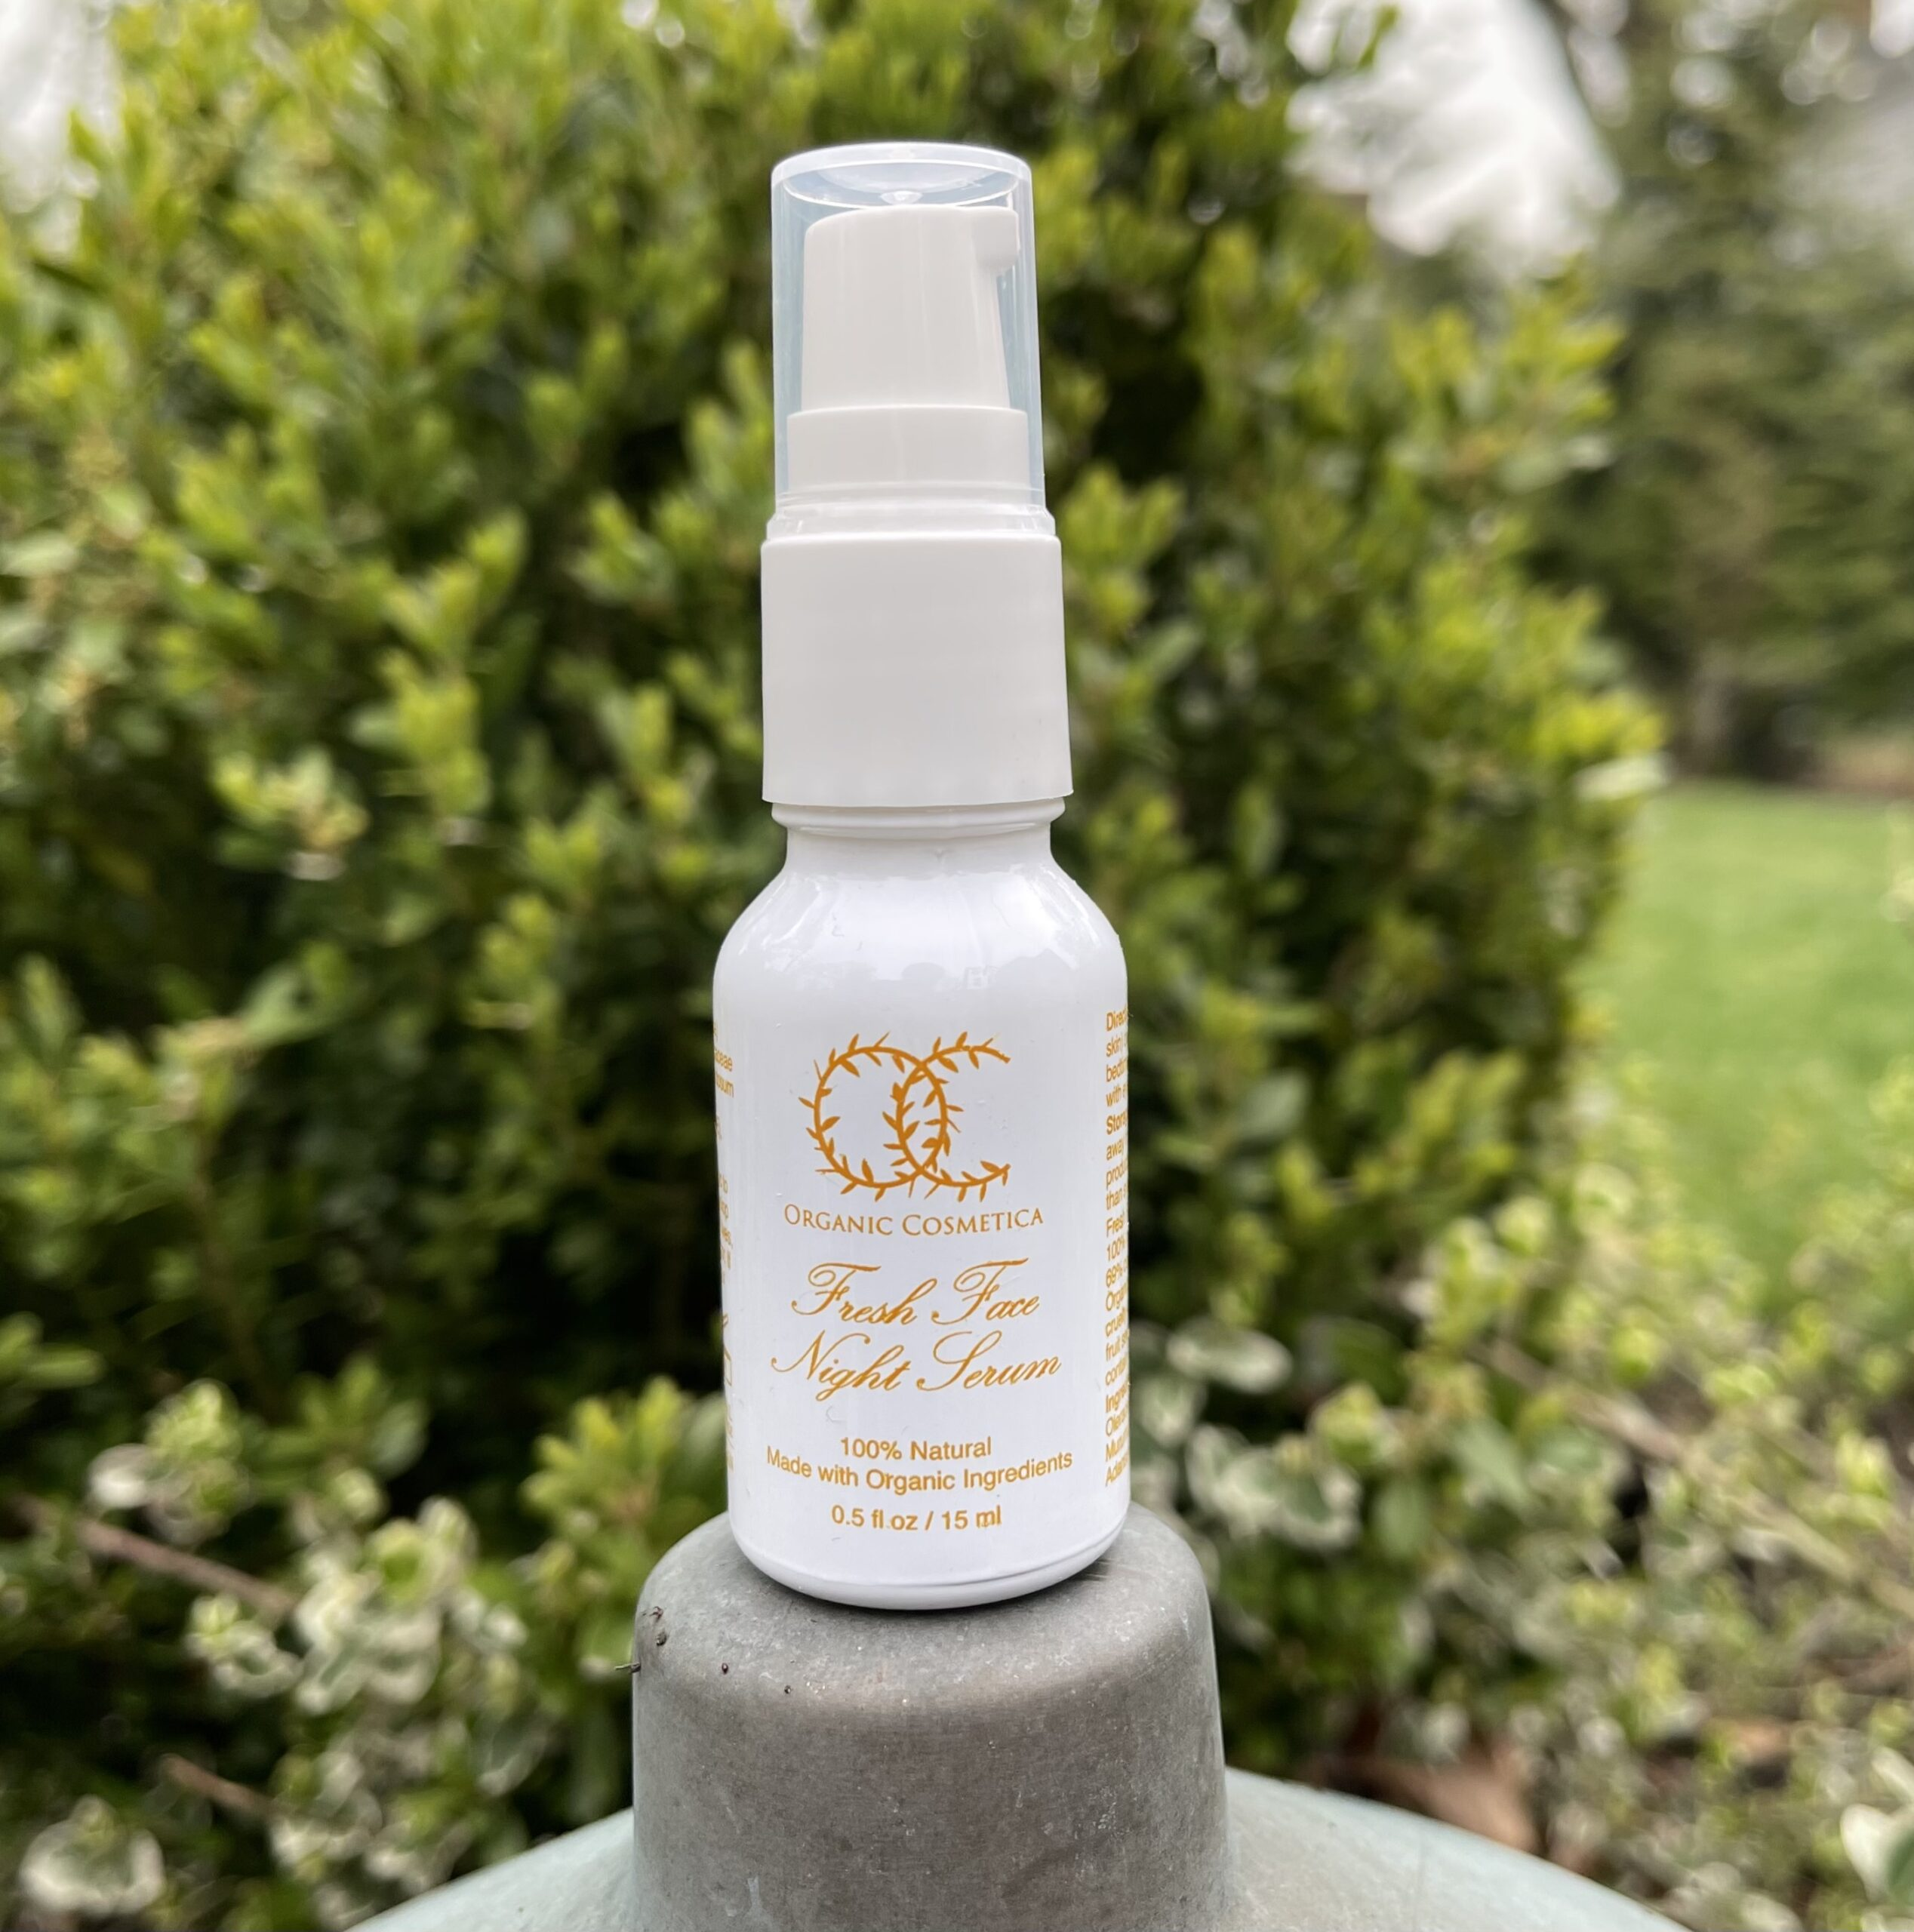 fresh face spray bottle -organic skin care